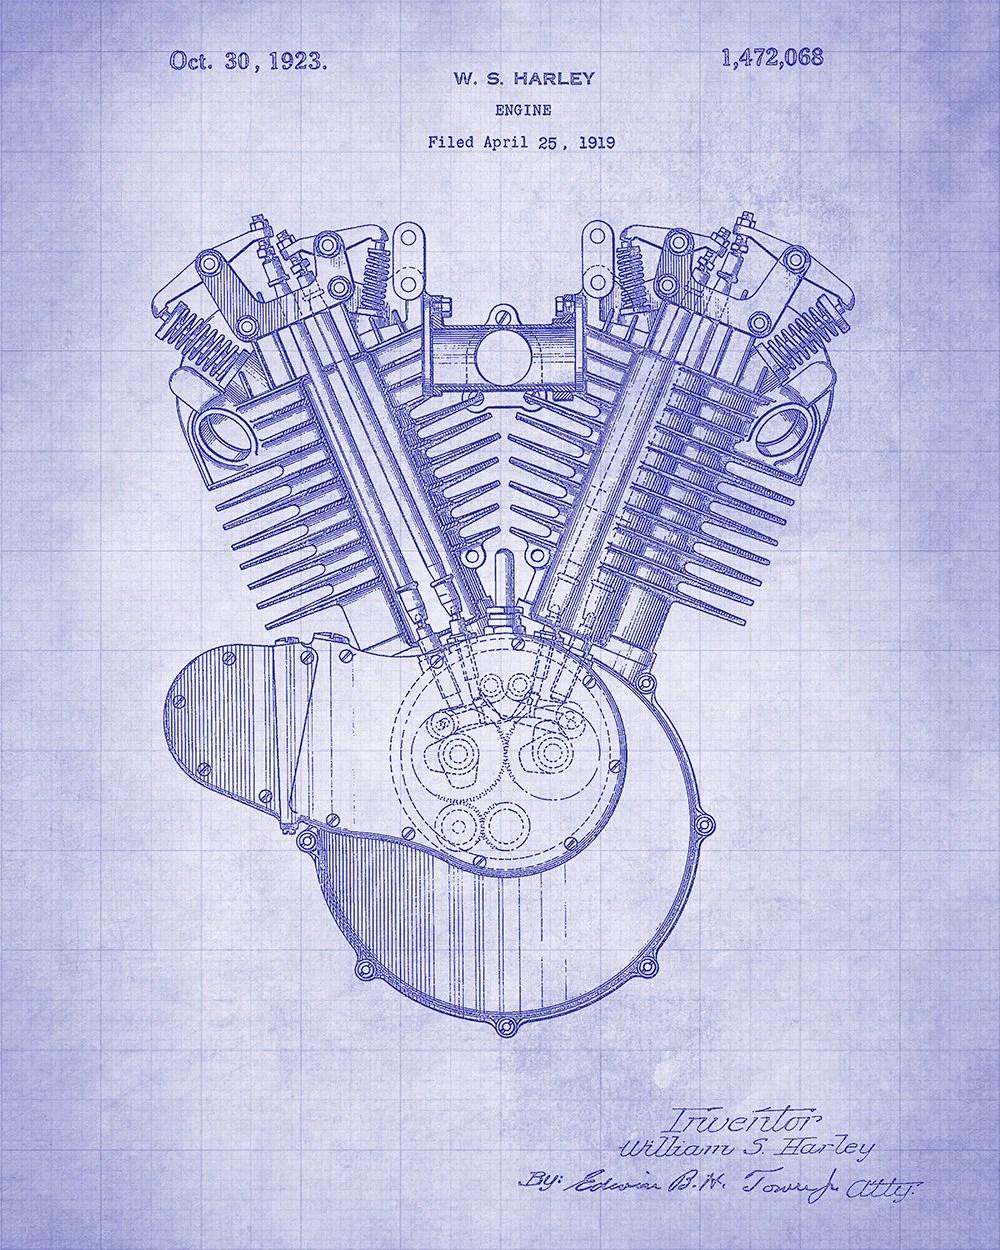 hight resolution of harley internal combustion engine patent art print harley davidson motorcycle engine patent art print harley davidson patent print